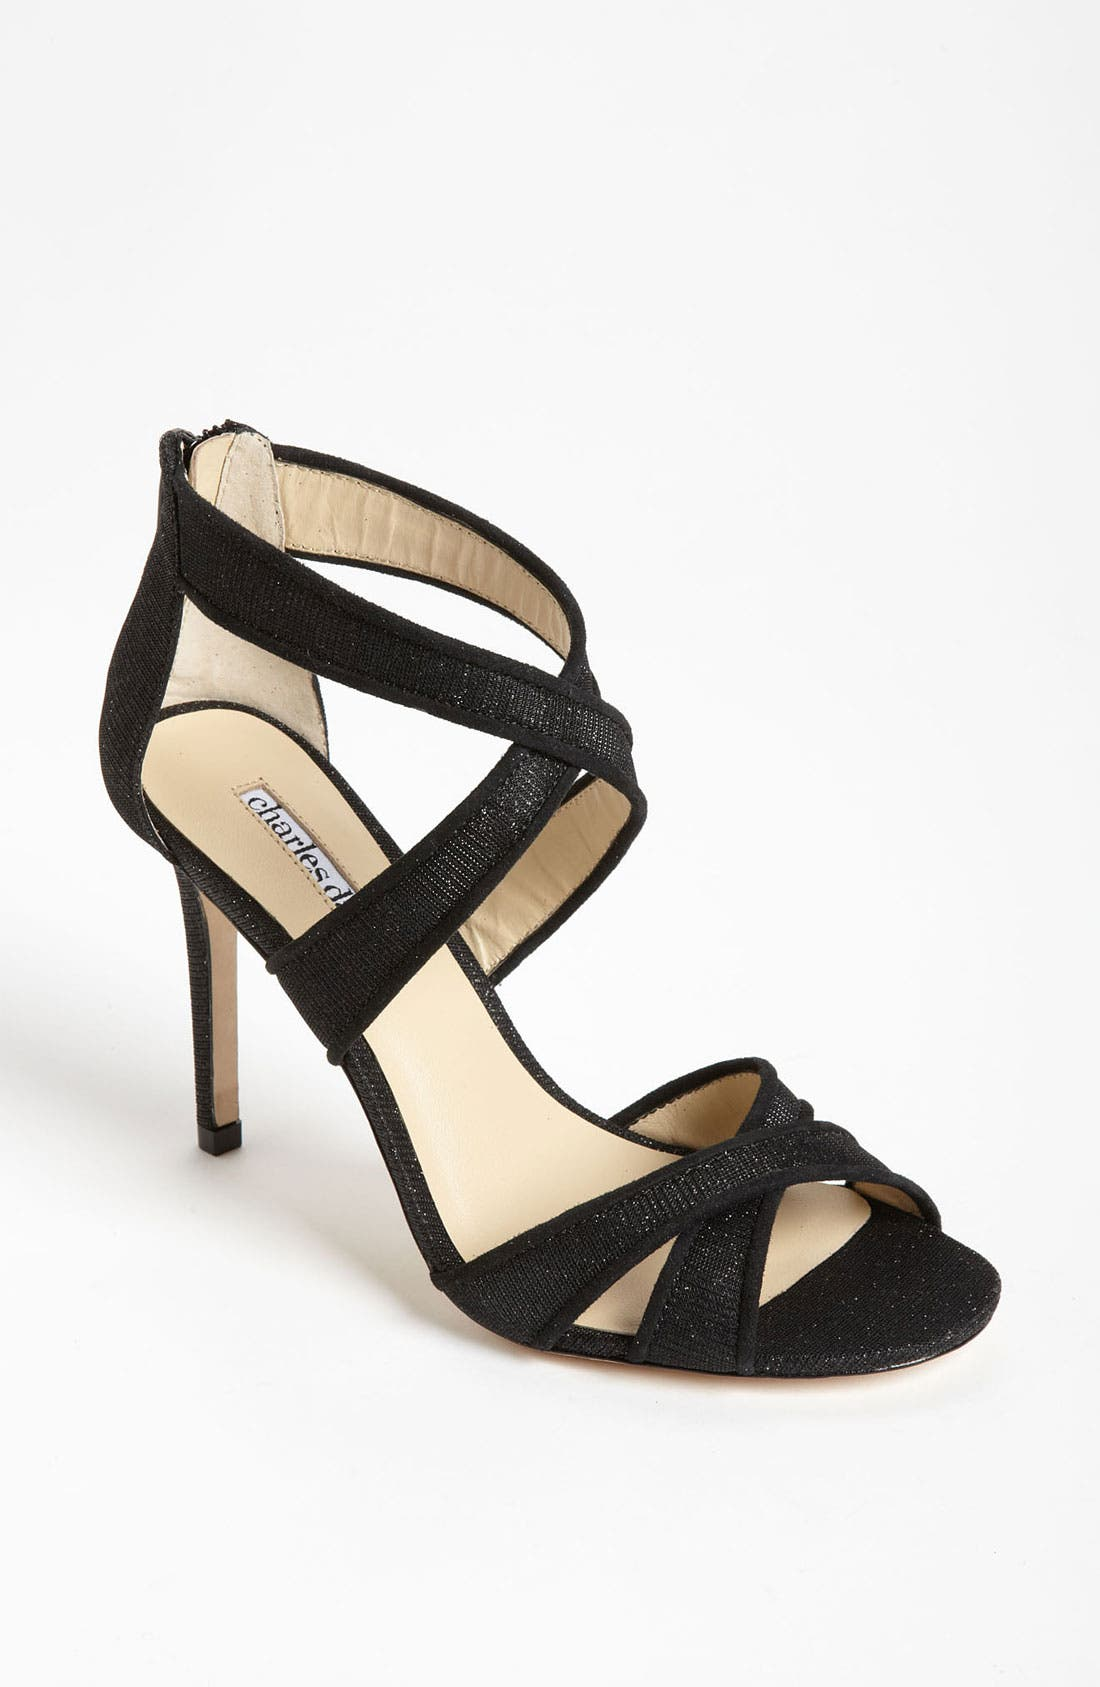 Alternate Image 1 Selected - Charles David 'Marcasite' Sandal